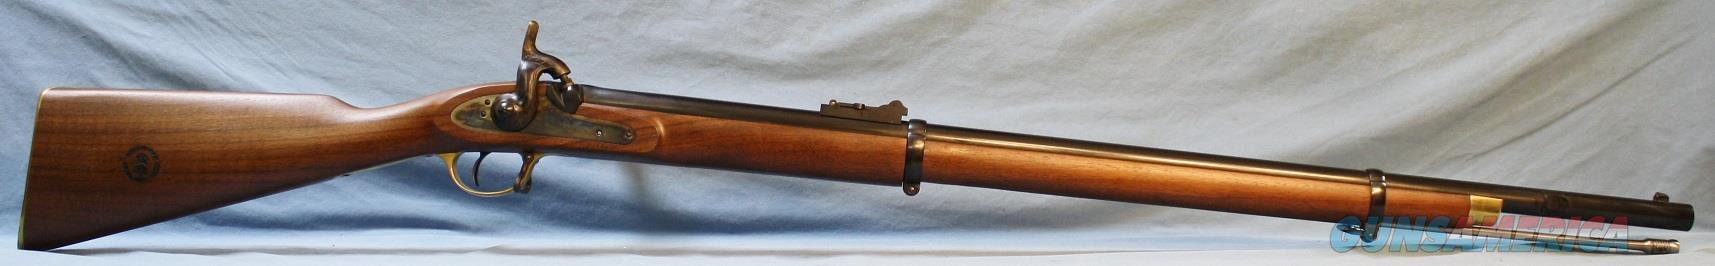 Pedersoli Model 1861 2 band Enfield Single Shot    for sale